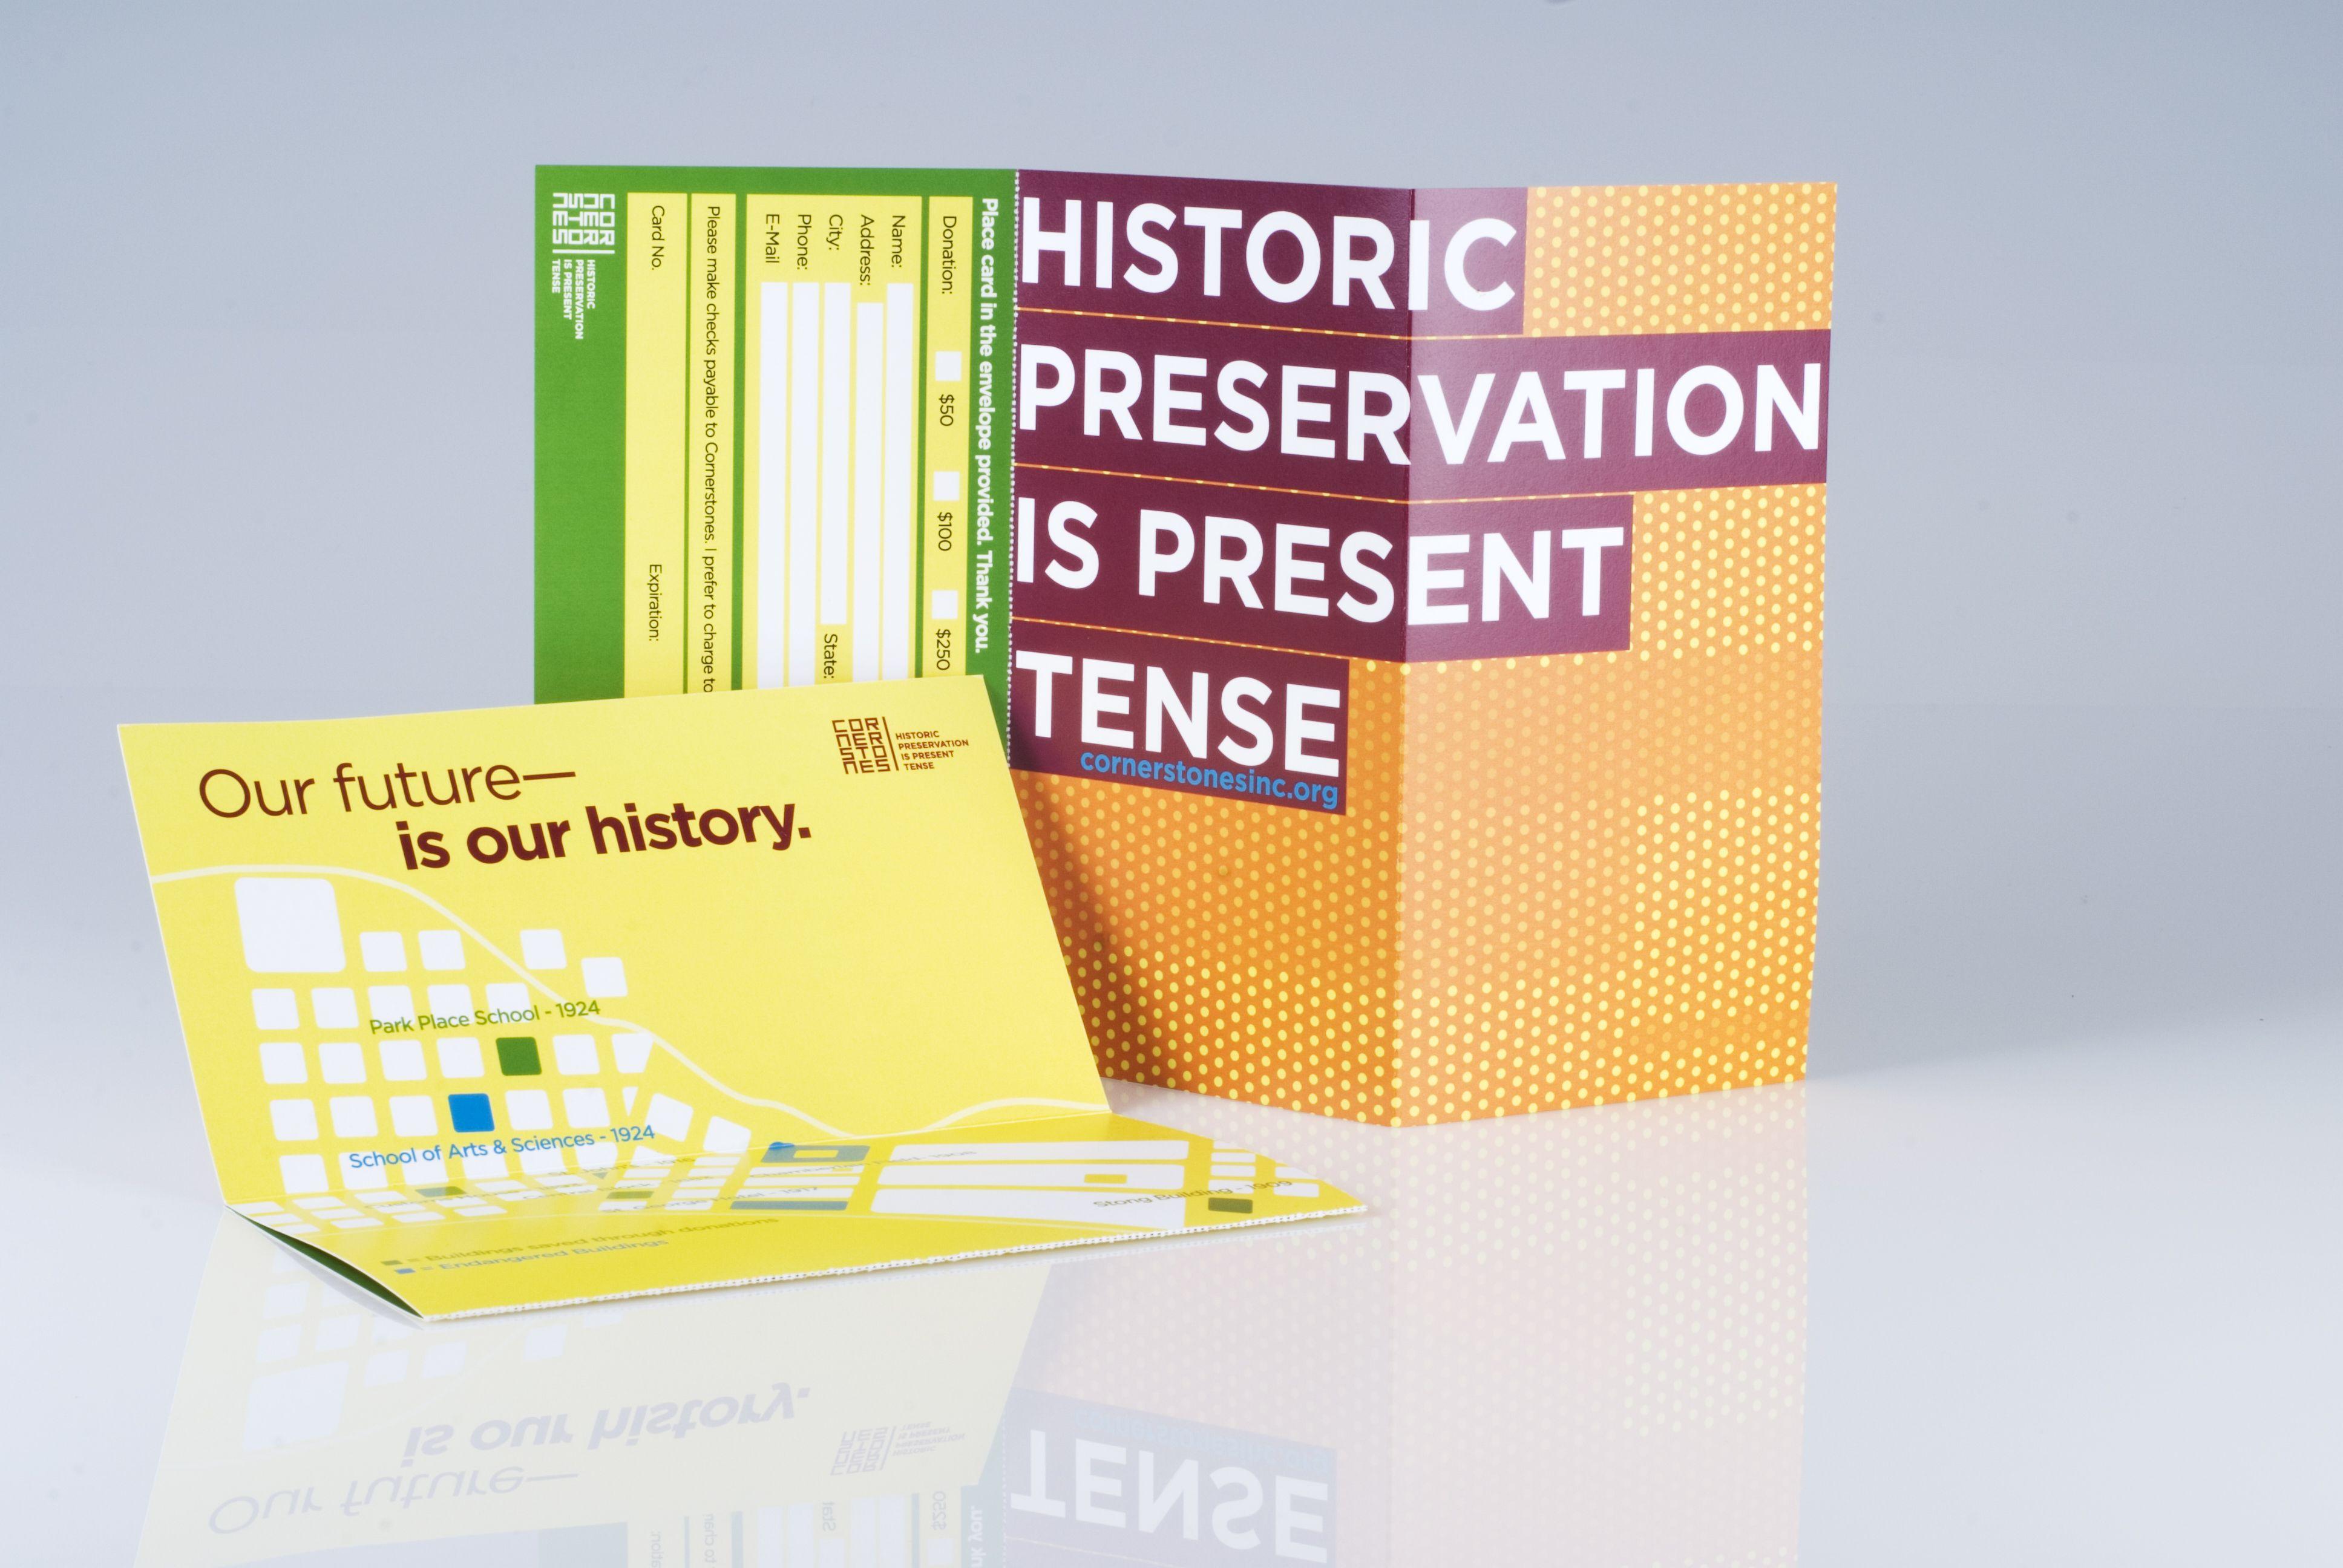 Home Page Modlich Monument Company - Brochure for cornerstones a historic preservation non profit